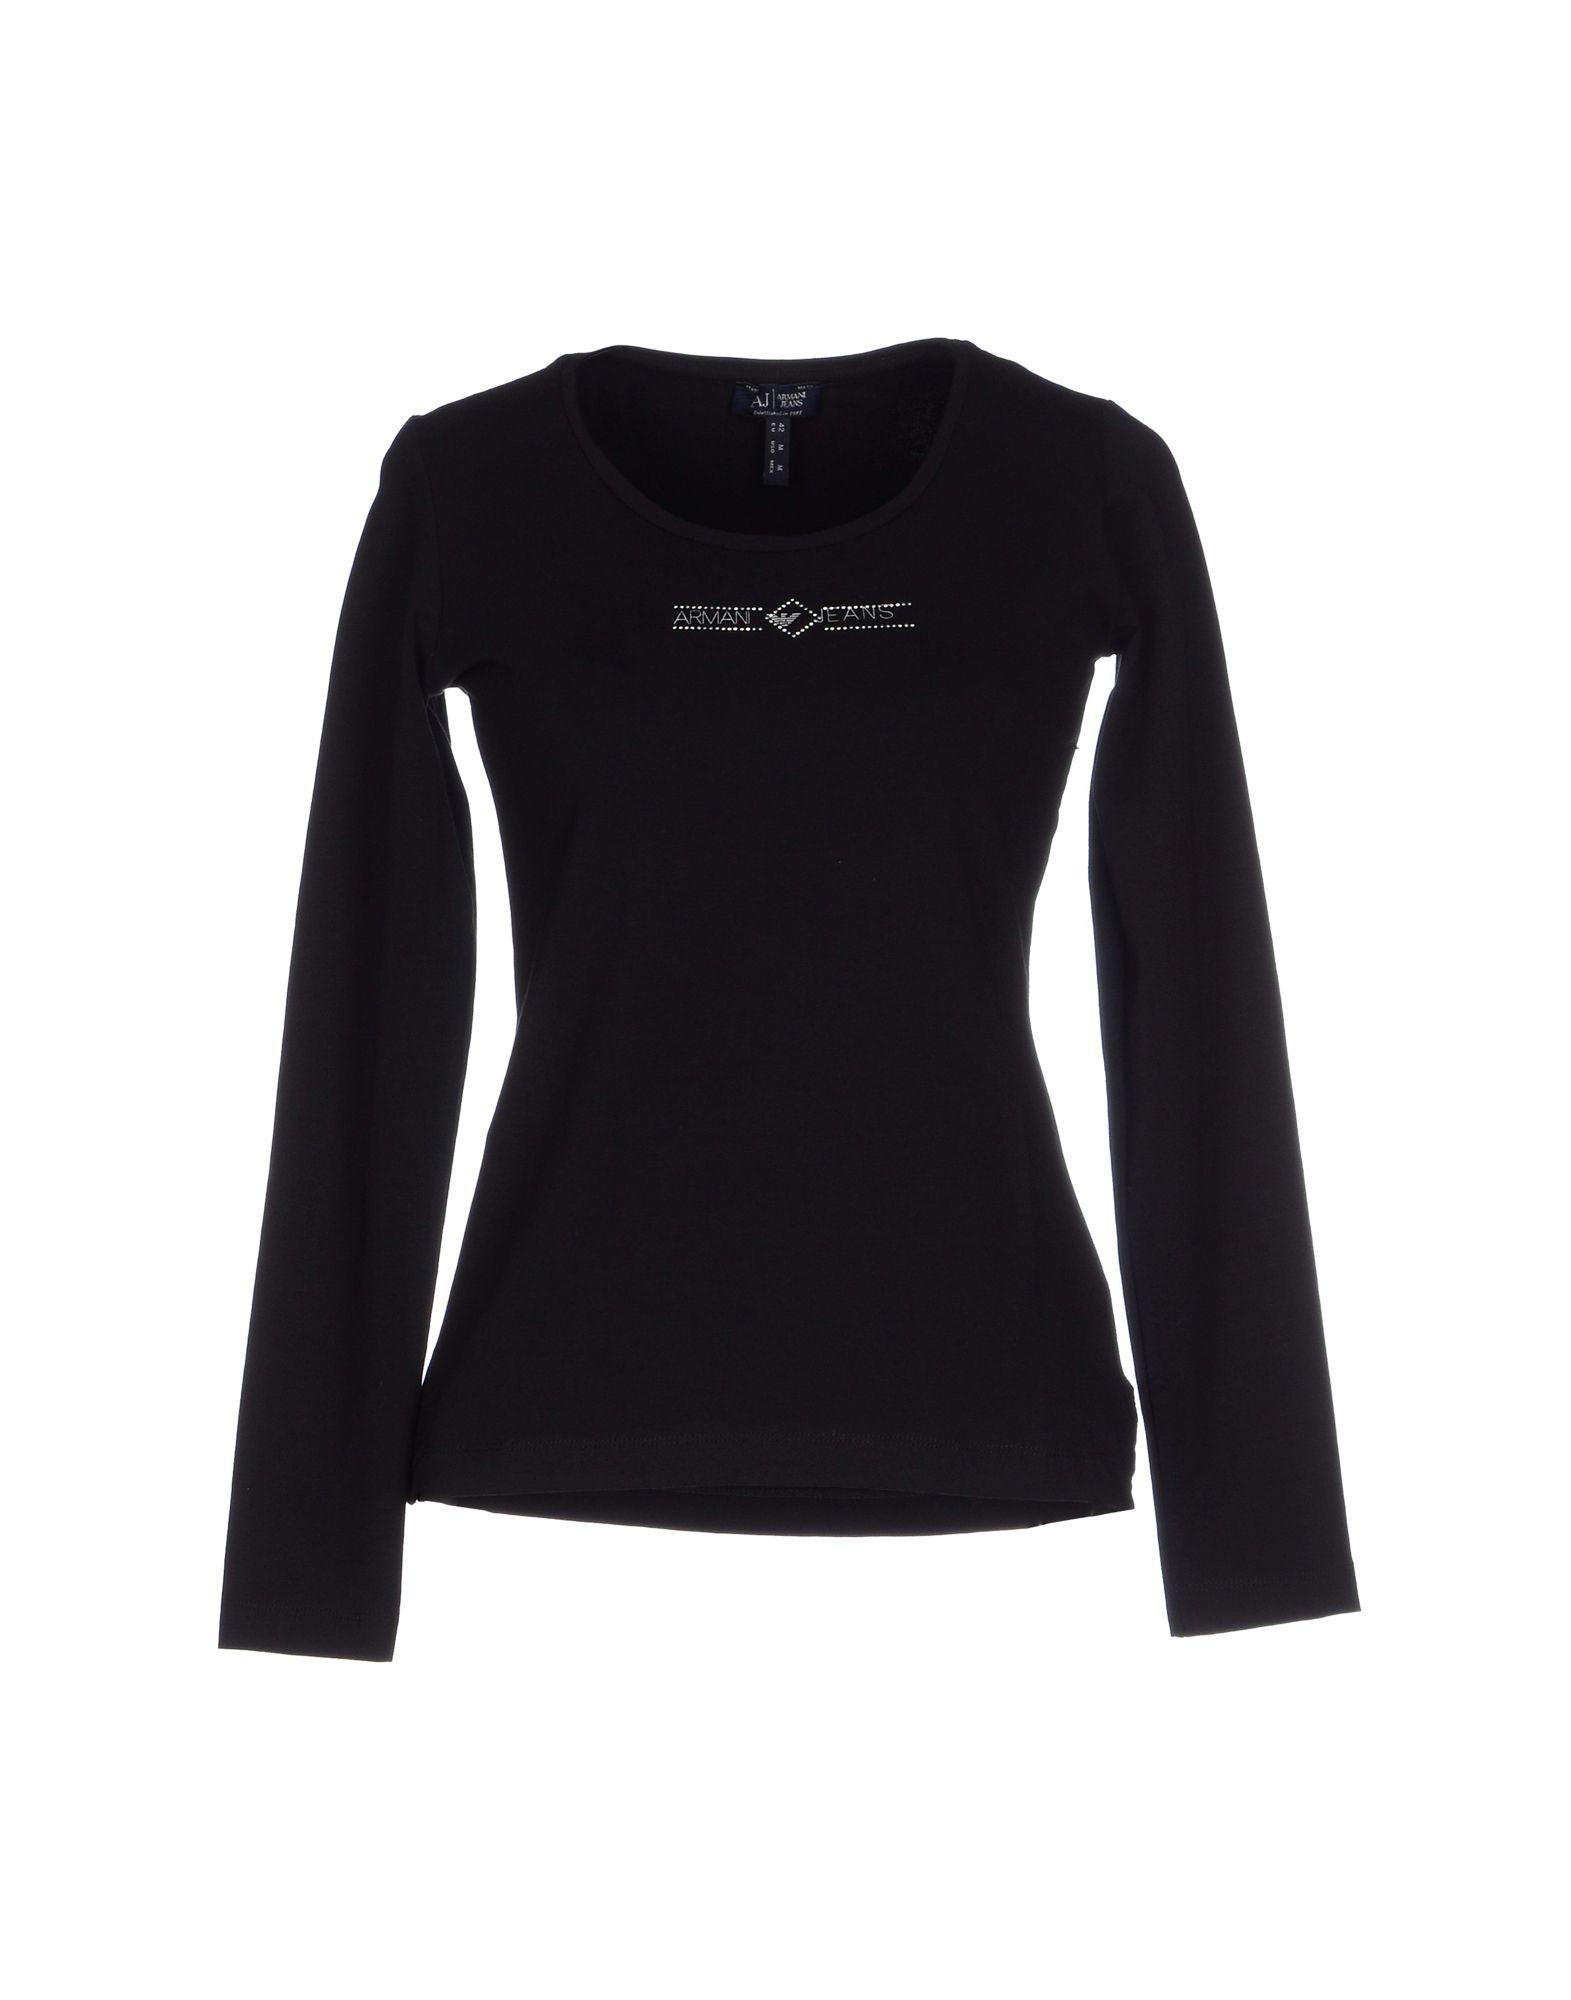 Lyst armani jeans t shirt in black for Black armani t shirt